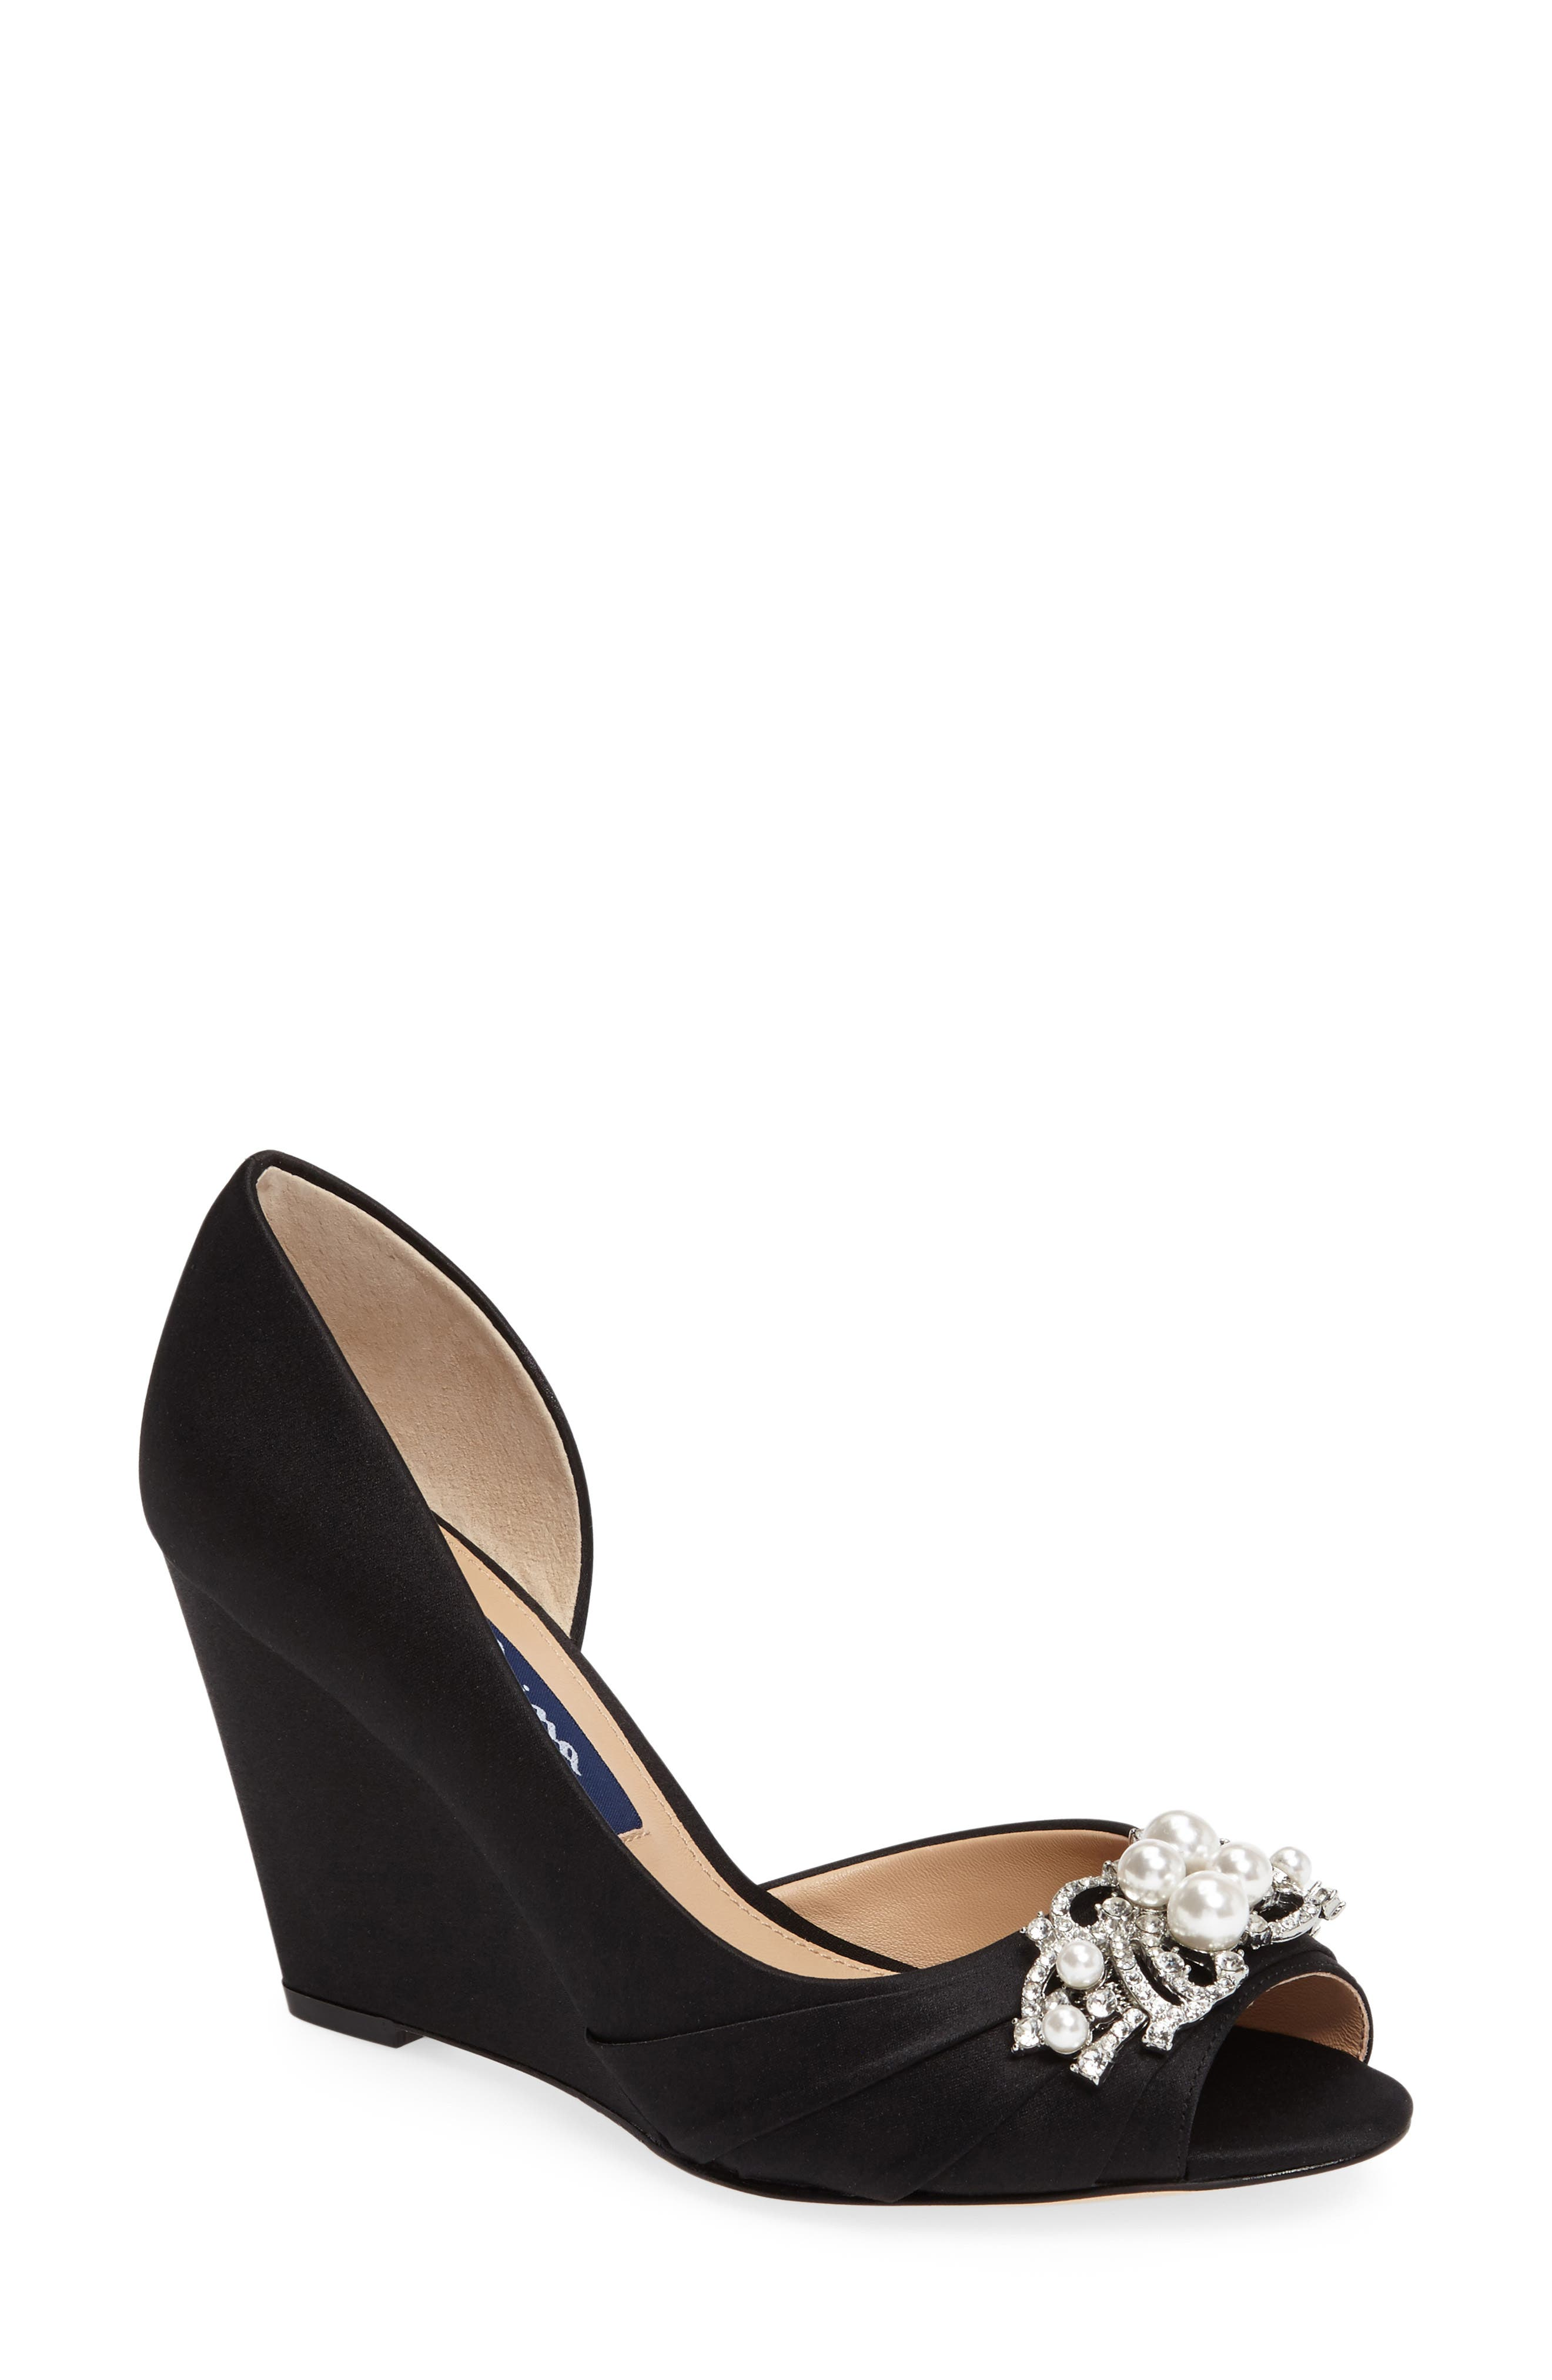 Rona Swarovski Wedge Sandal,                         Main,                         color, 003